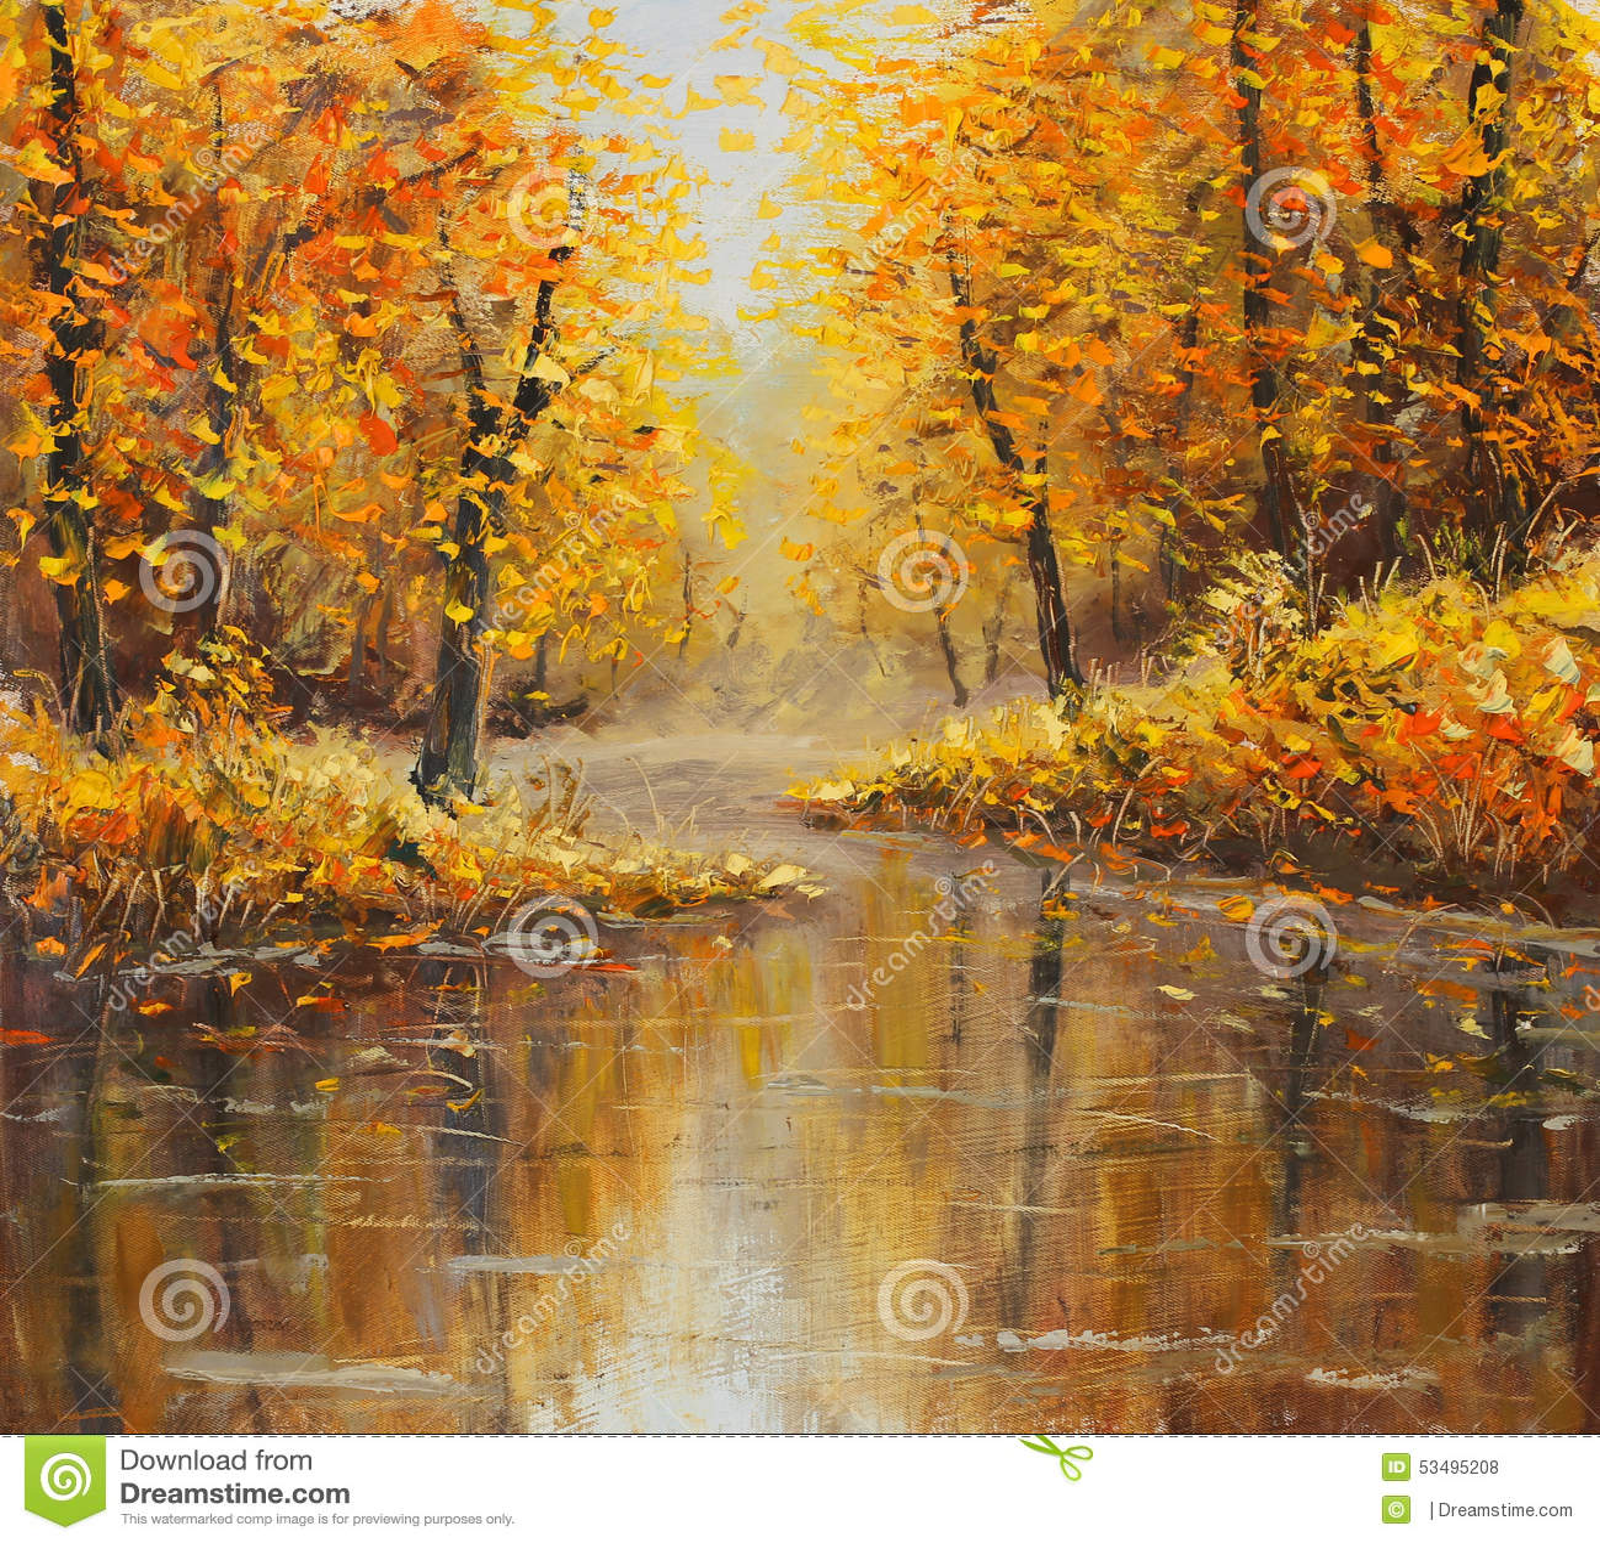 Golden autumn in river. Yellow oil painting. Art.